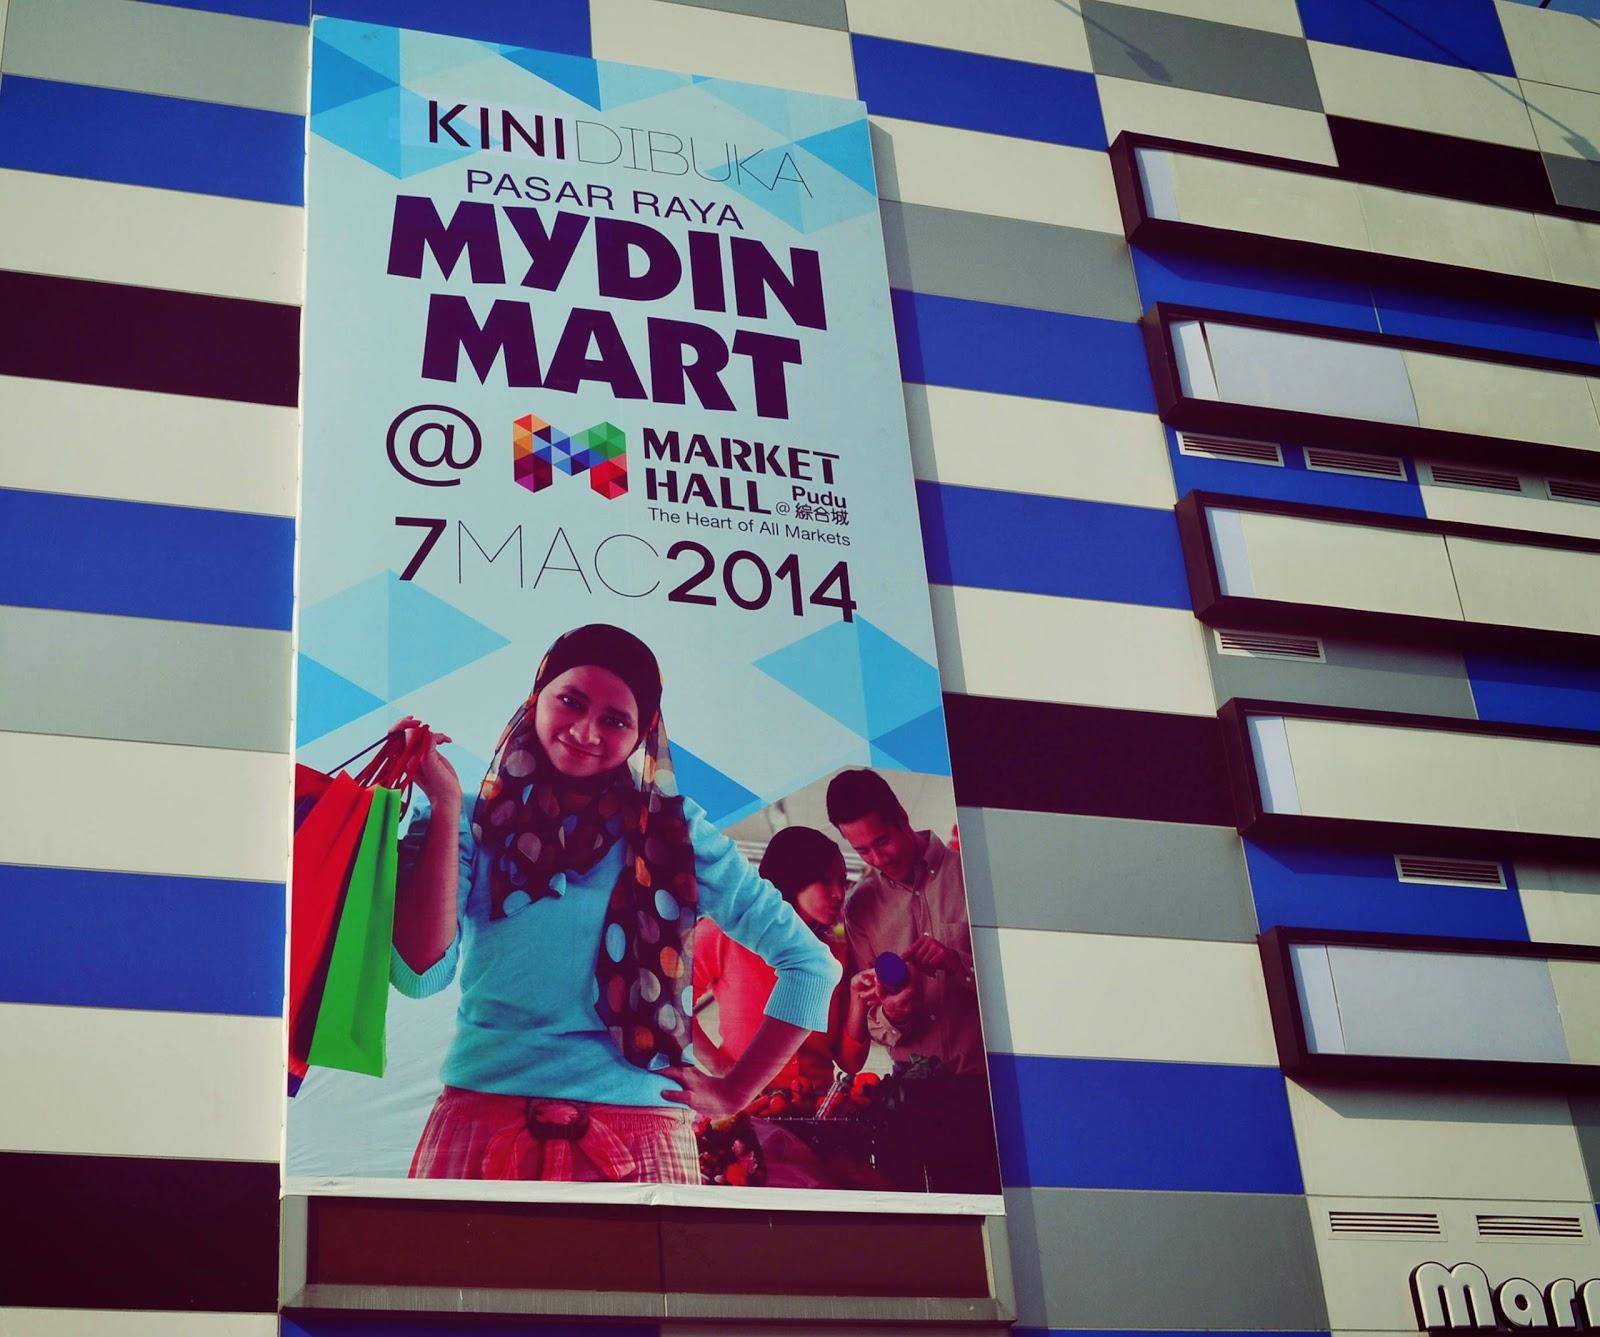 Pembukaan Mydin Mart di Market Hall Pudu Kuala Lumpur